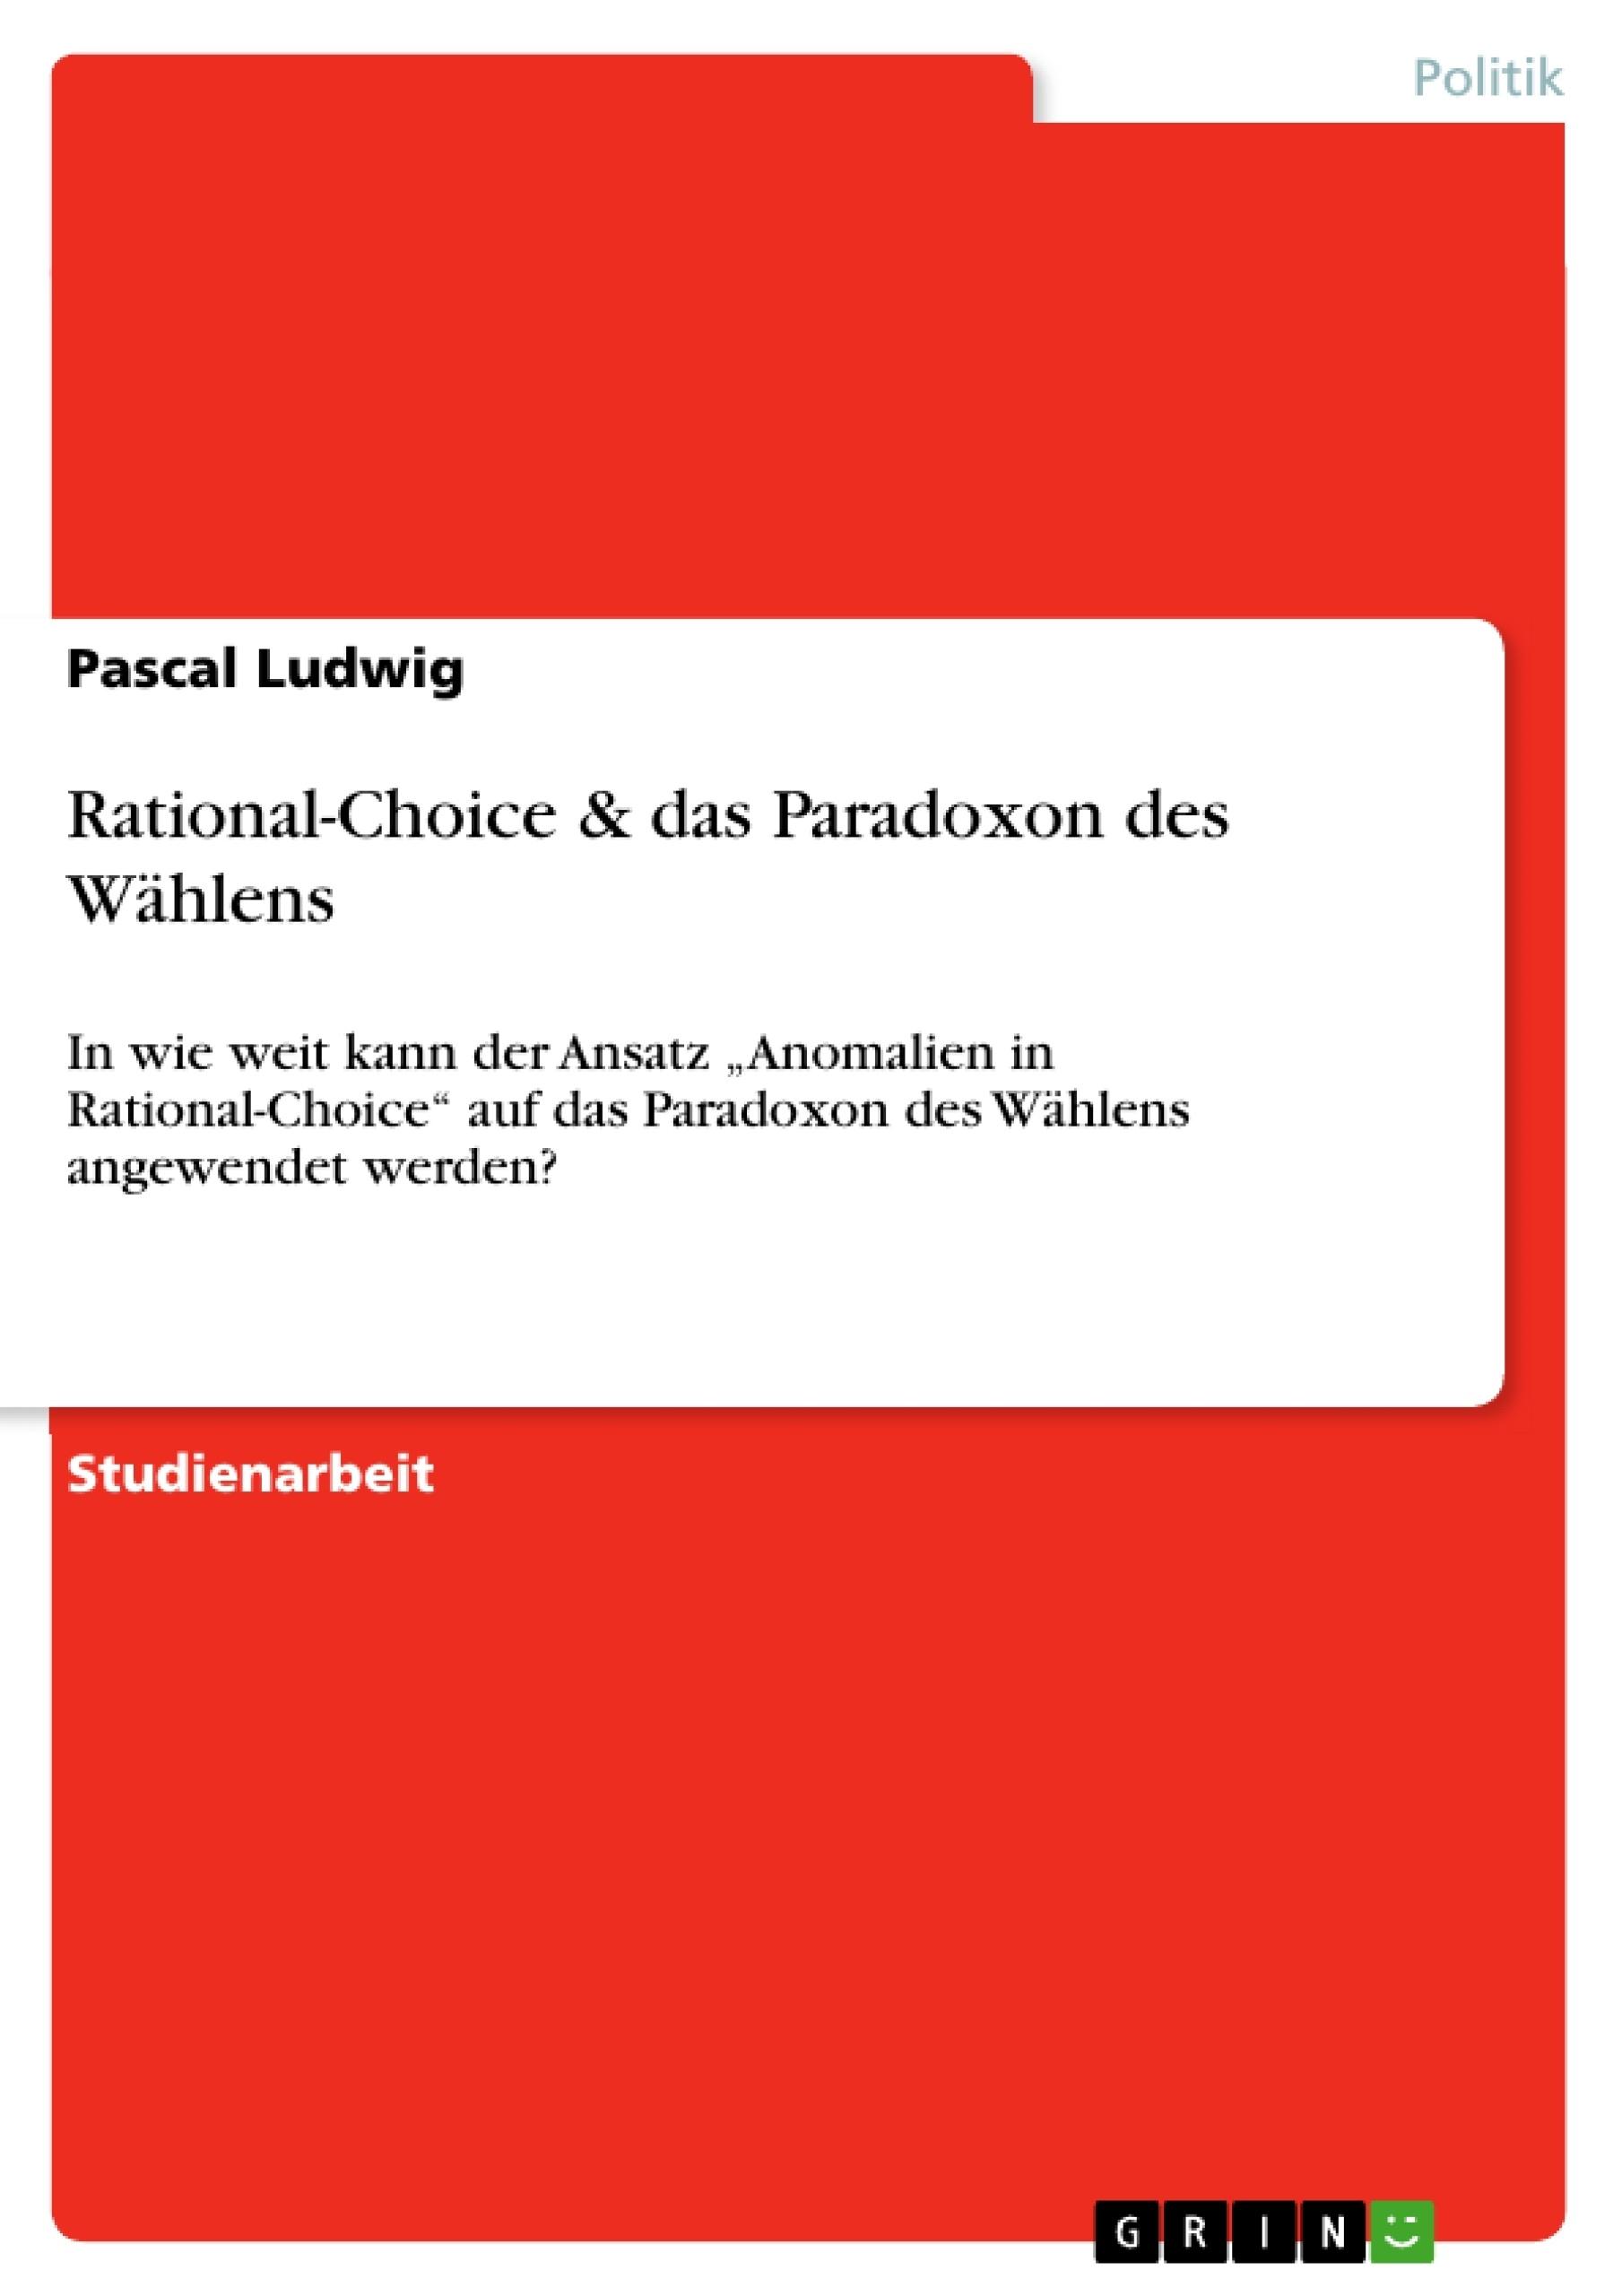 Titel: Rational-Choice & das Paradoxon des Wählens